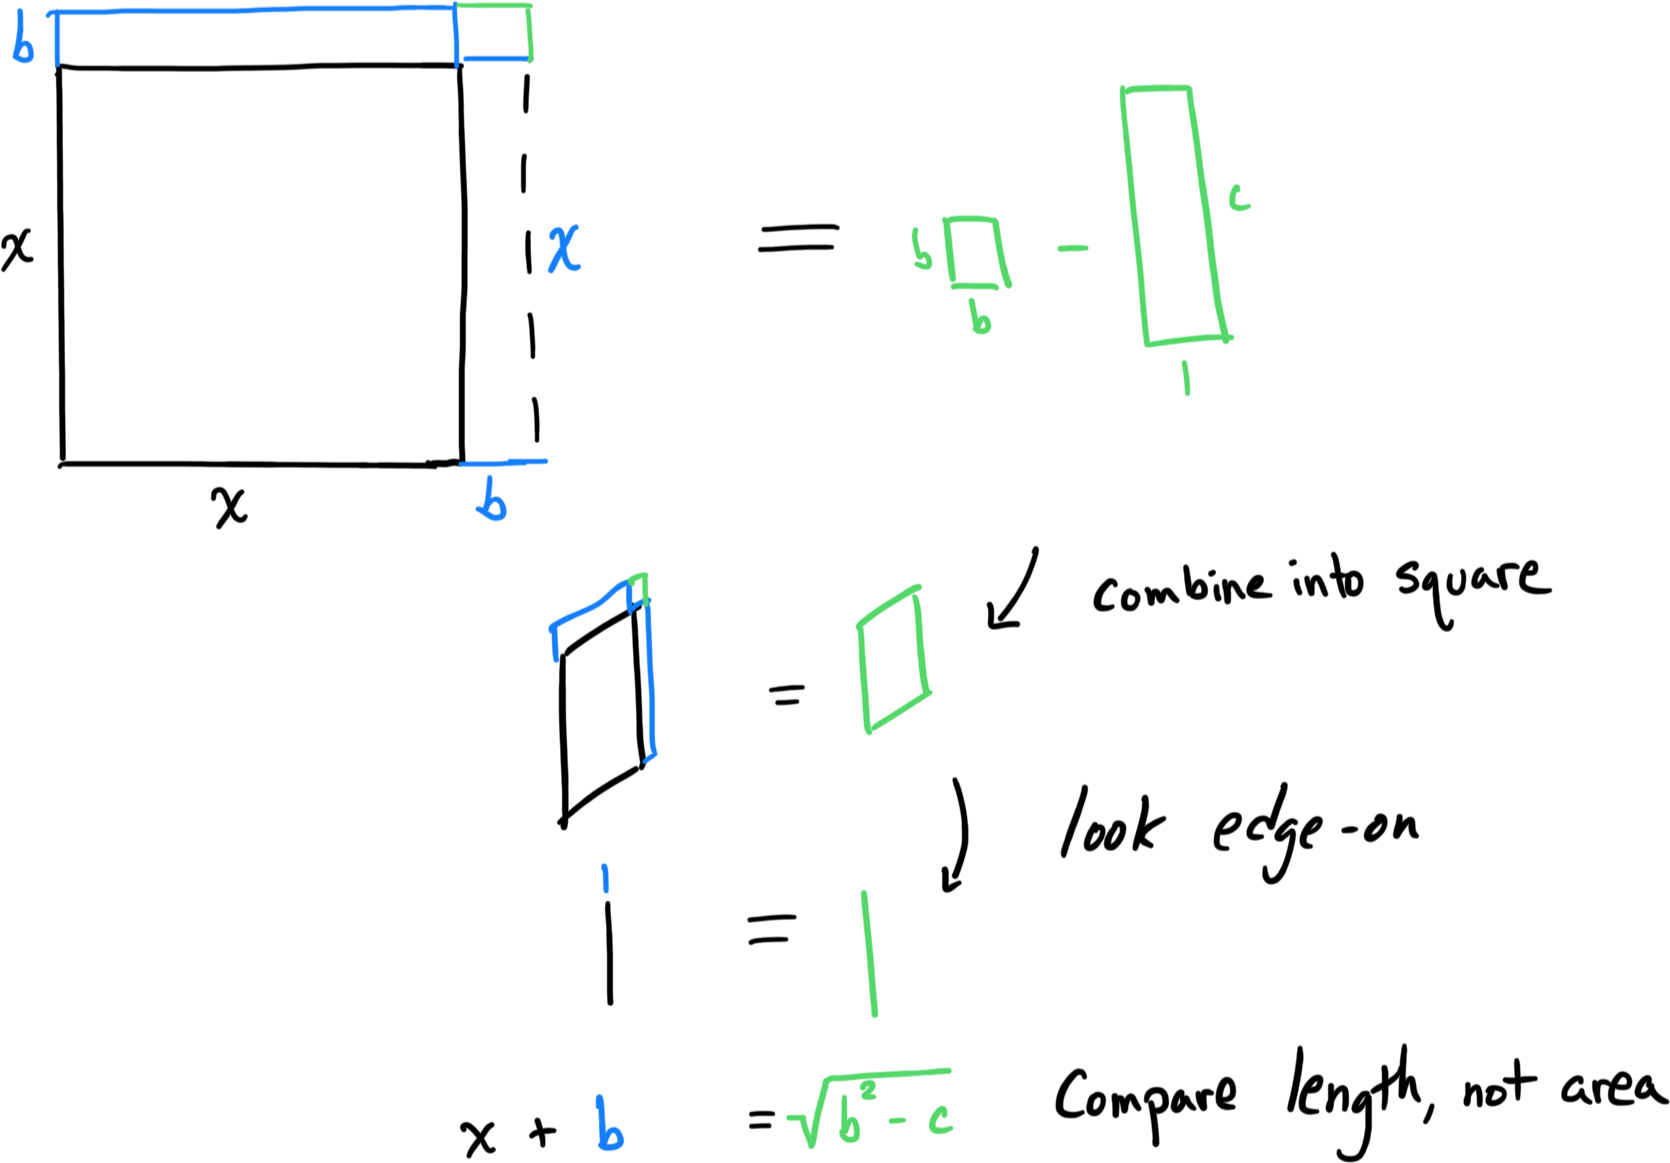 Intuition for the Quadratic Formula – BetterExplained